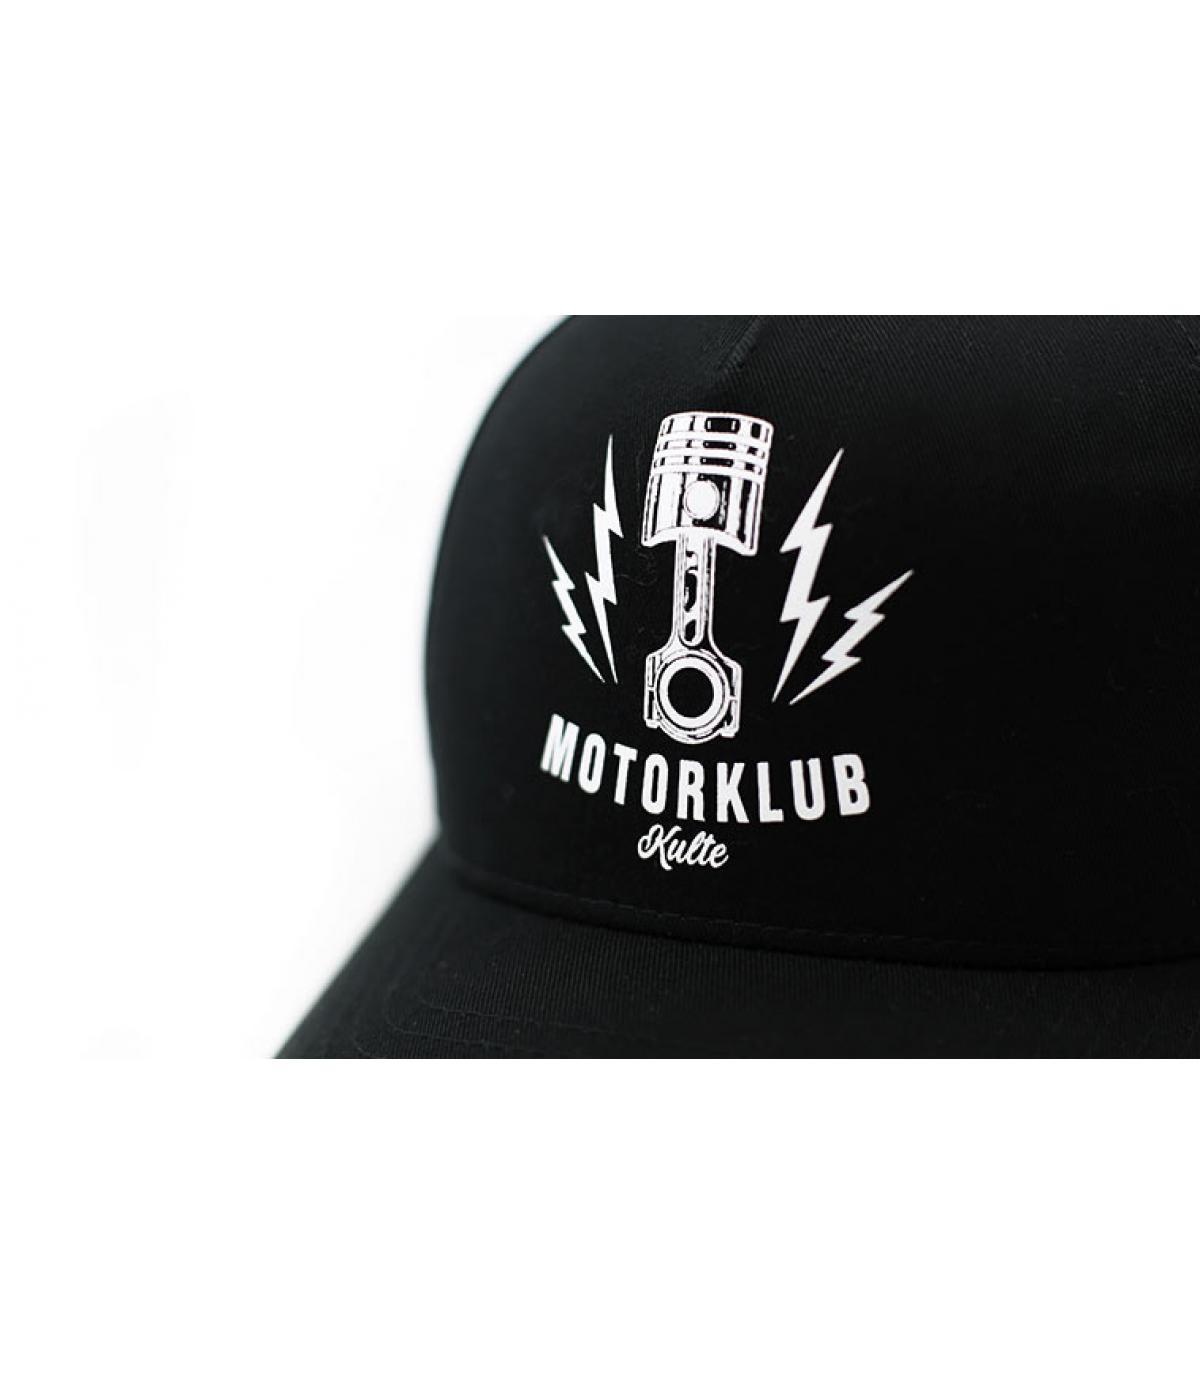 Details Motorklub black - afbeeling 3